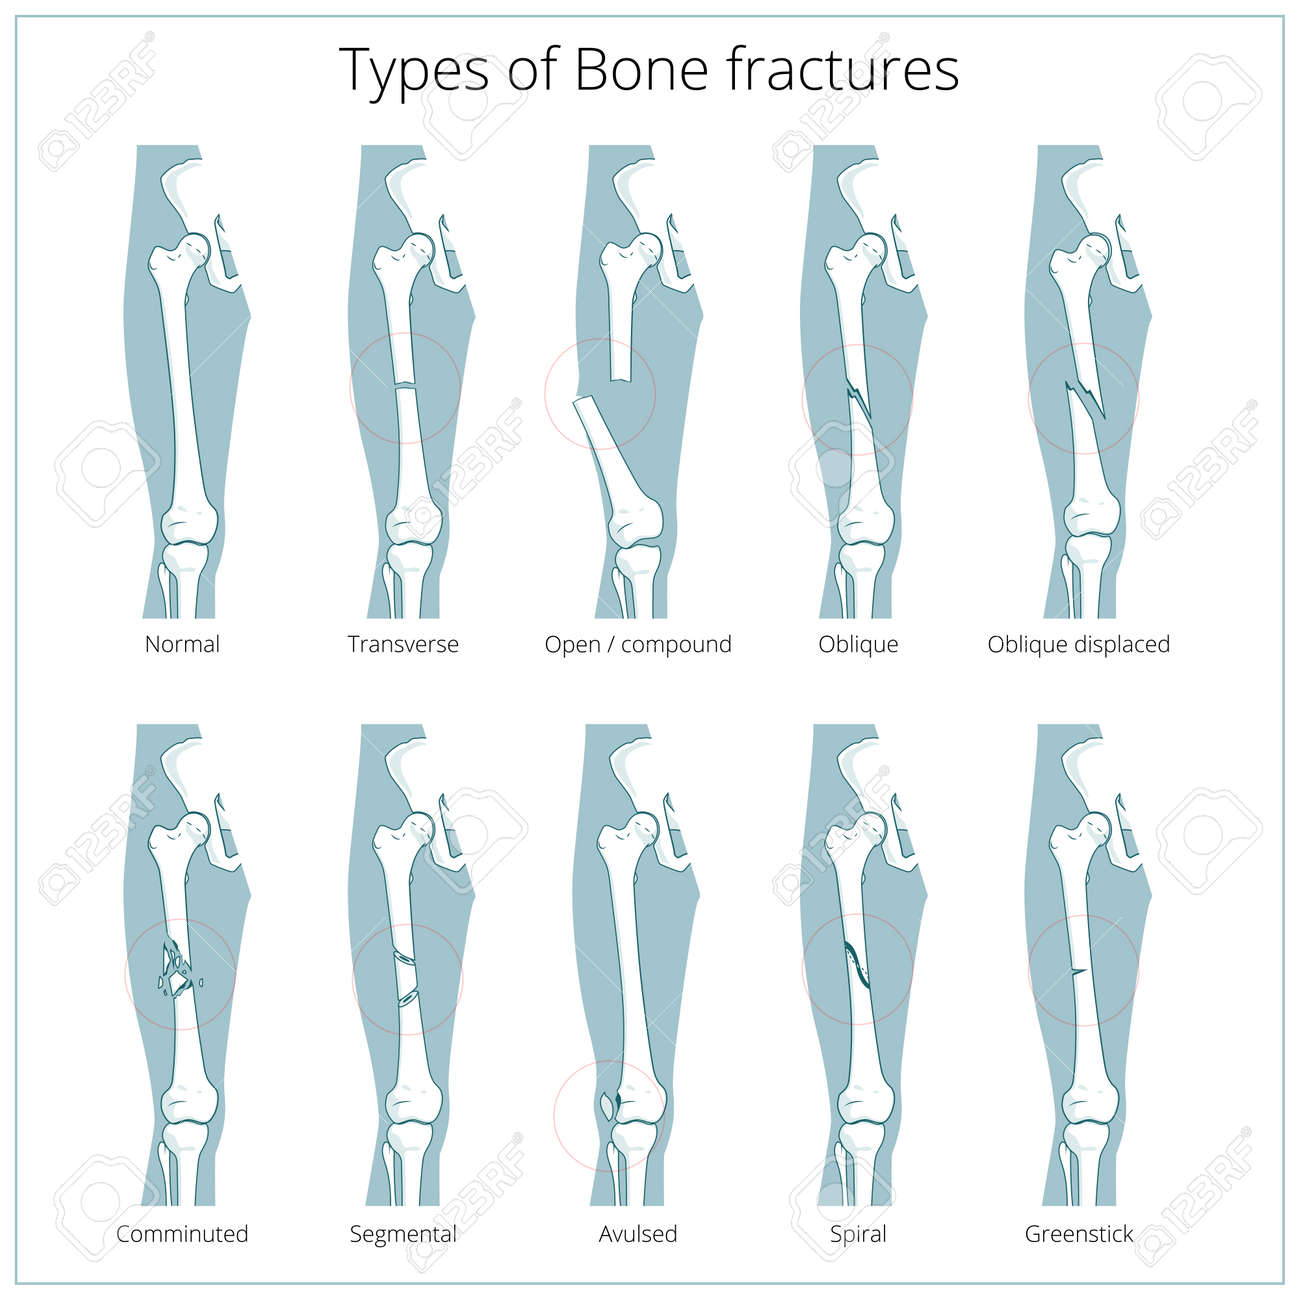 Types Of Bone Fractures Medical Skeleton Anatomy Educational Stock